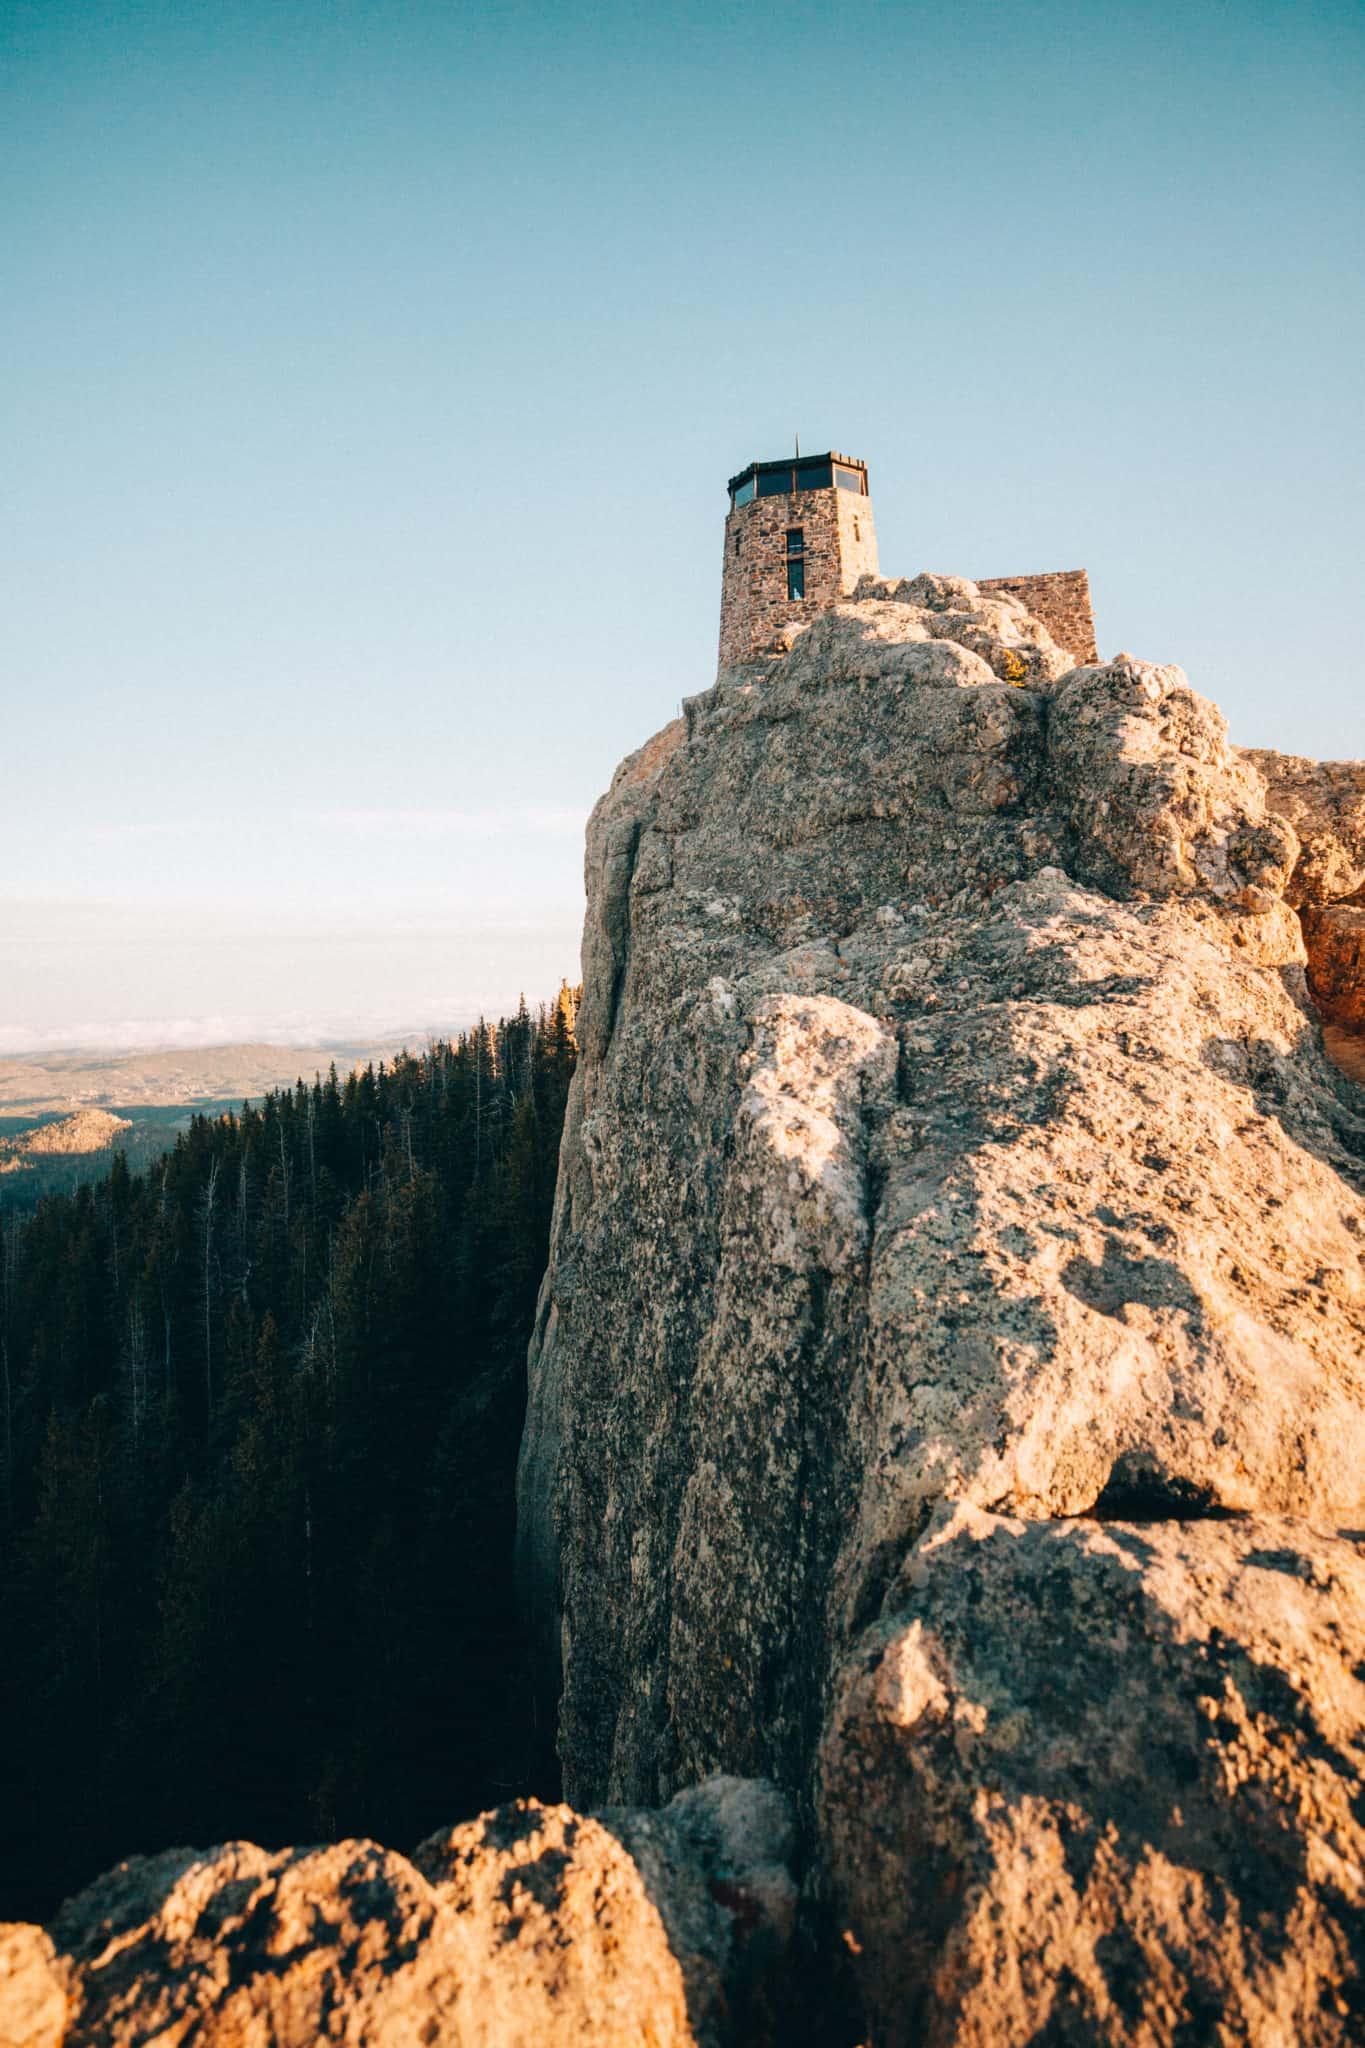 Fire Lookout summit view at Black Elk Peak Trail, South Dakota